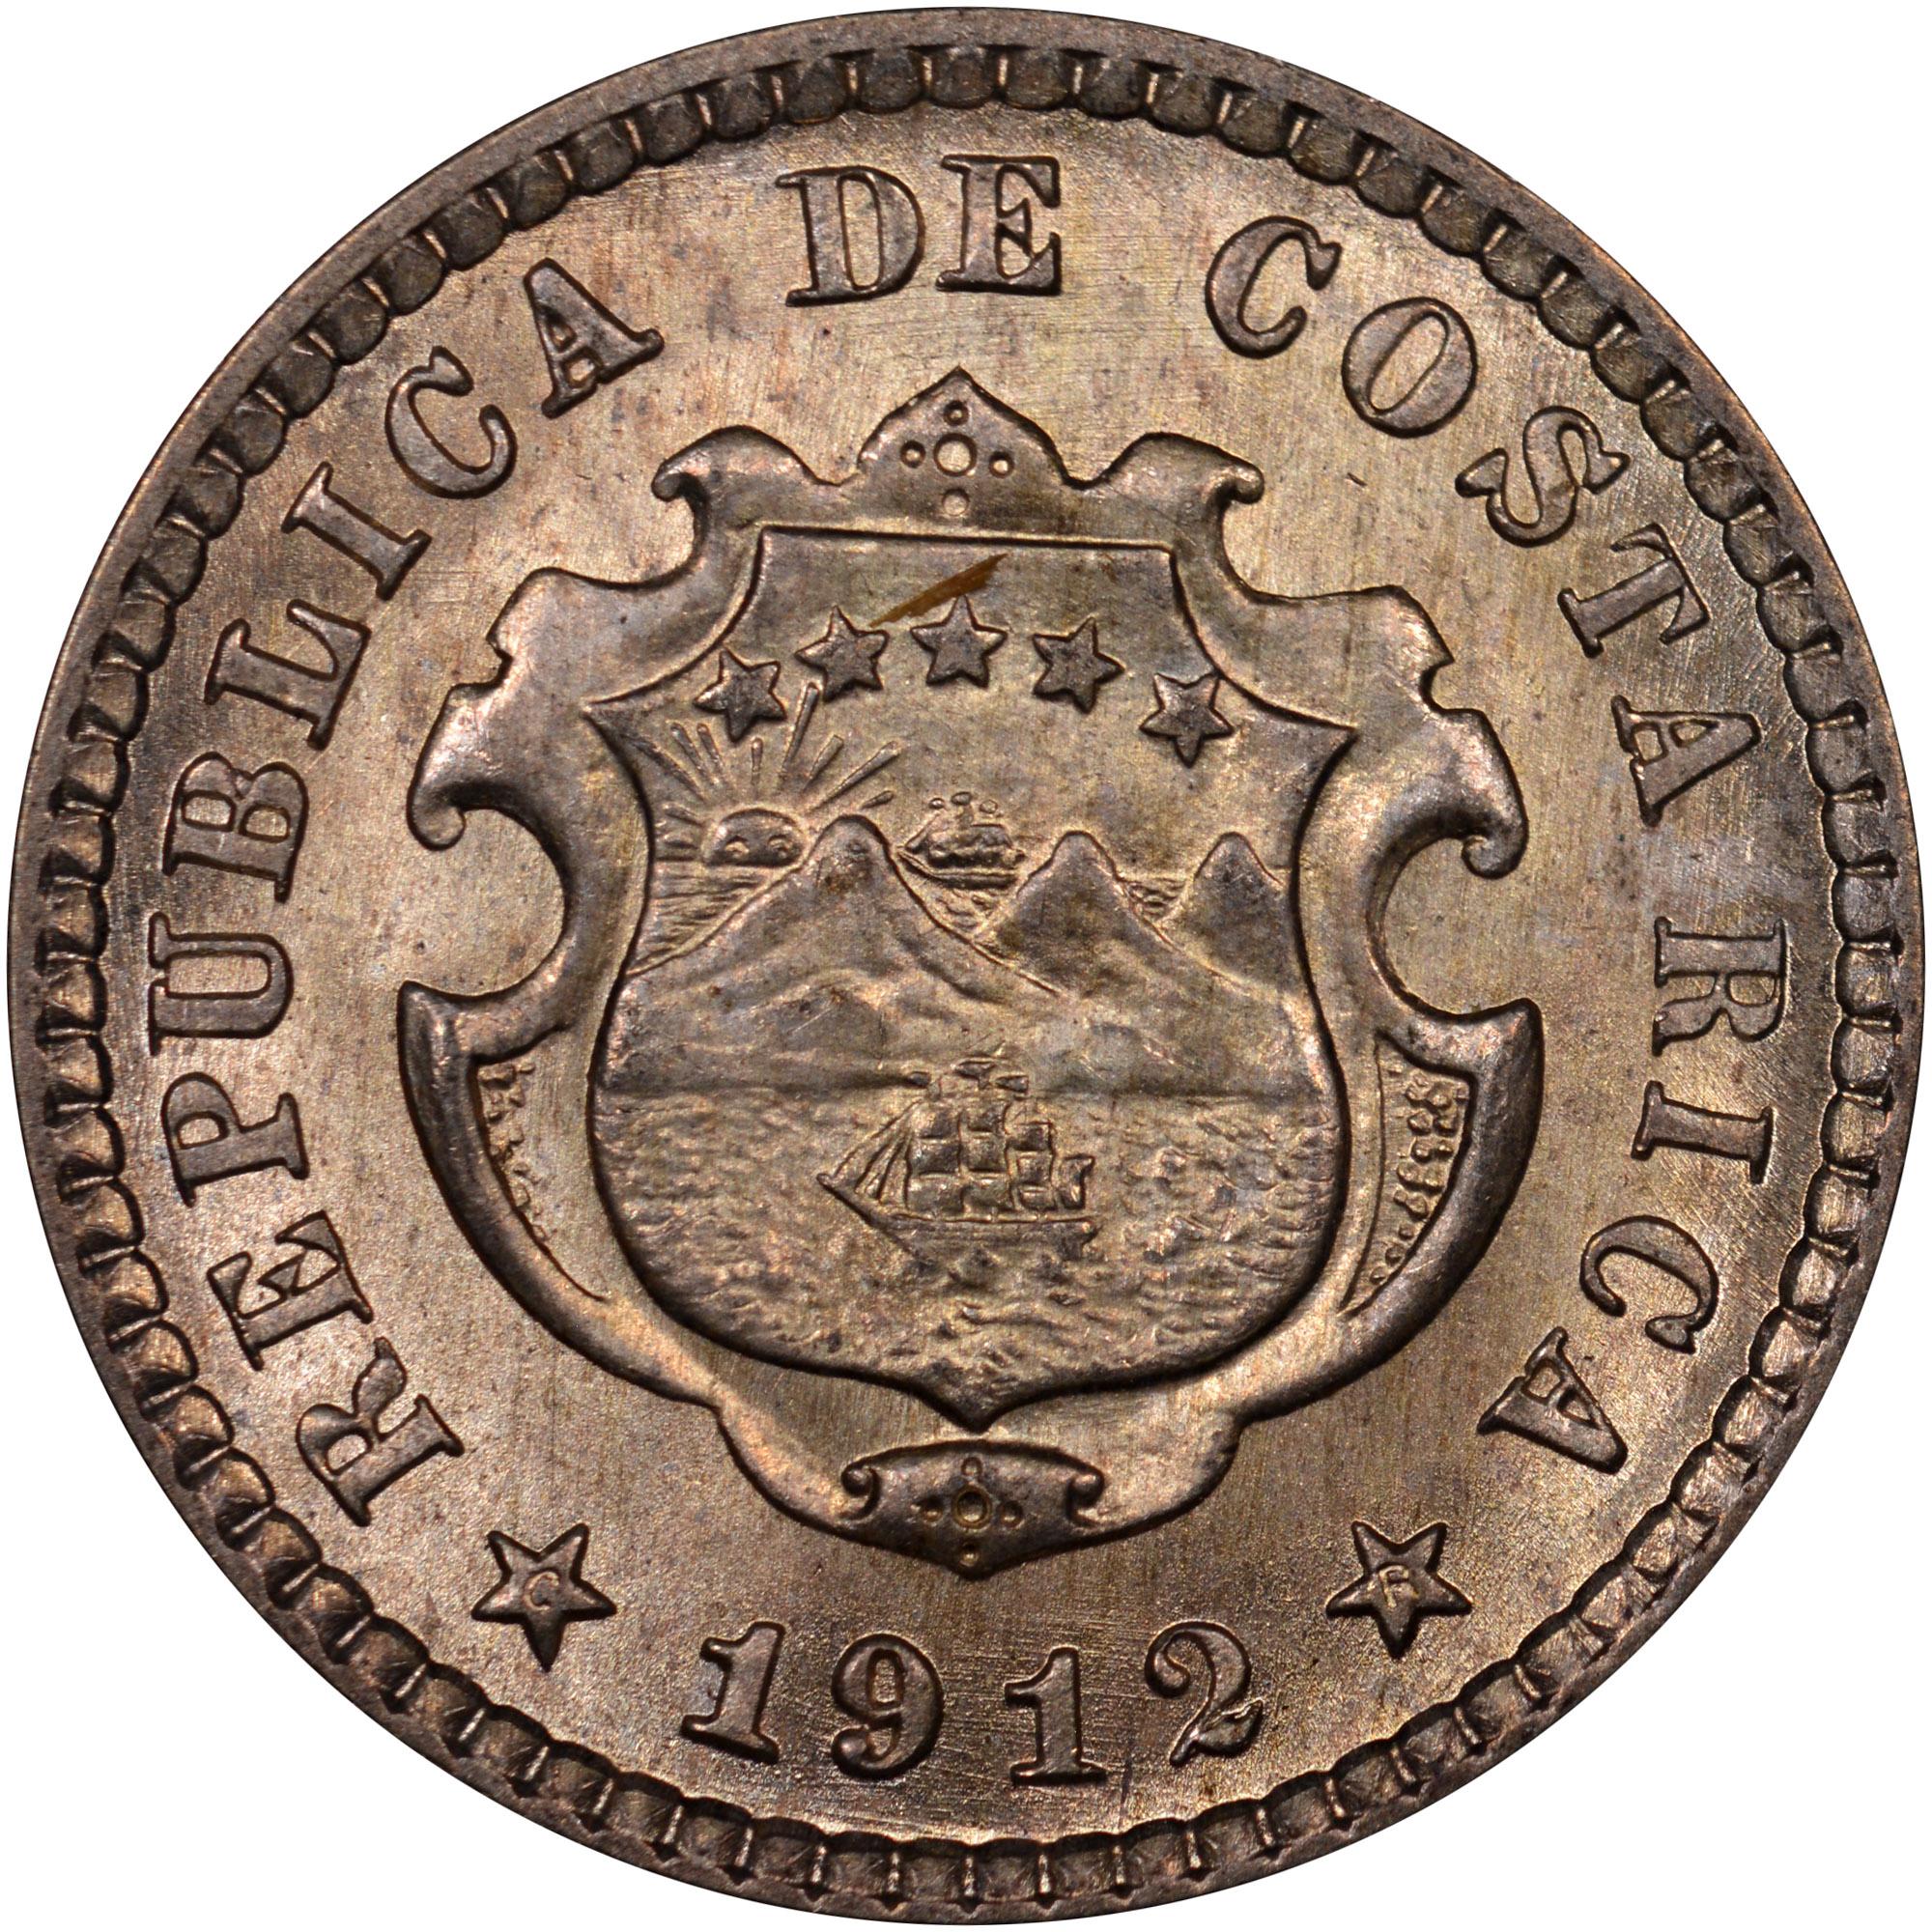 1905-1914 Costa Rica 5 Centimos obverse